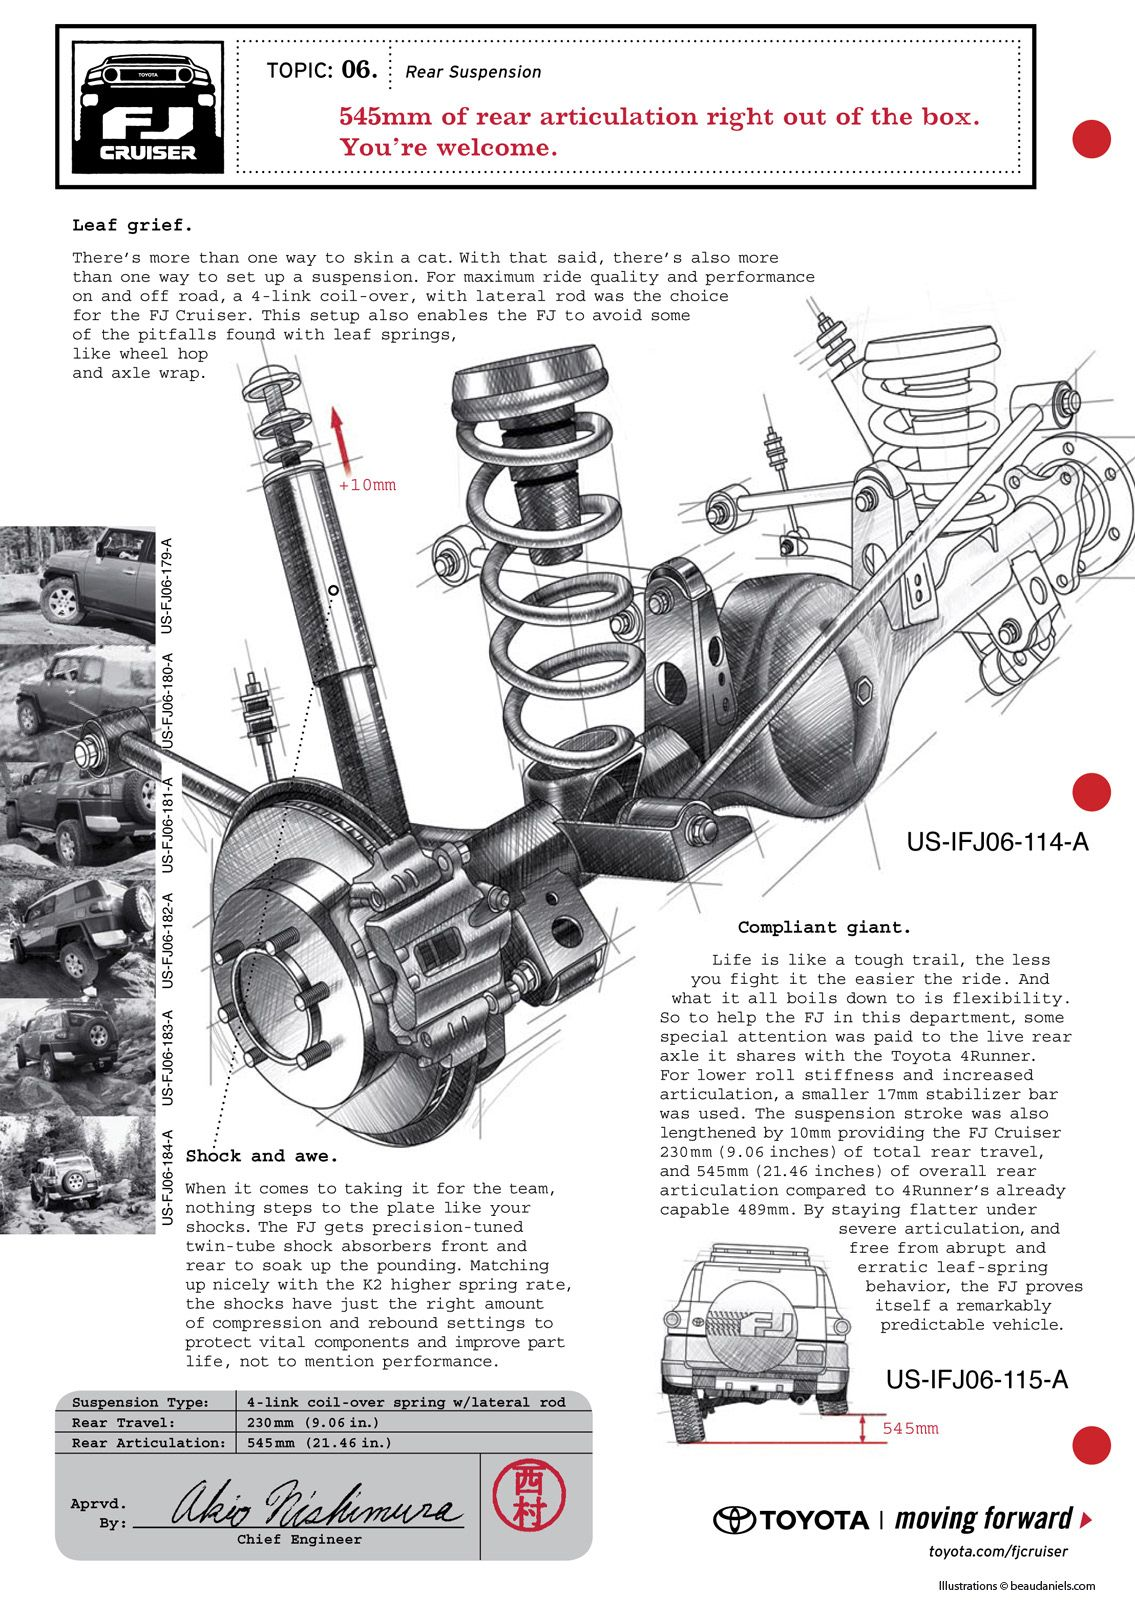 fj cruiser ads rear suspension technical illustration toyota fjfj cruiser ads rear suspension technical illustration [ 1135 x 1600 Pixel ]